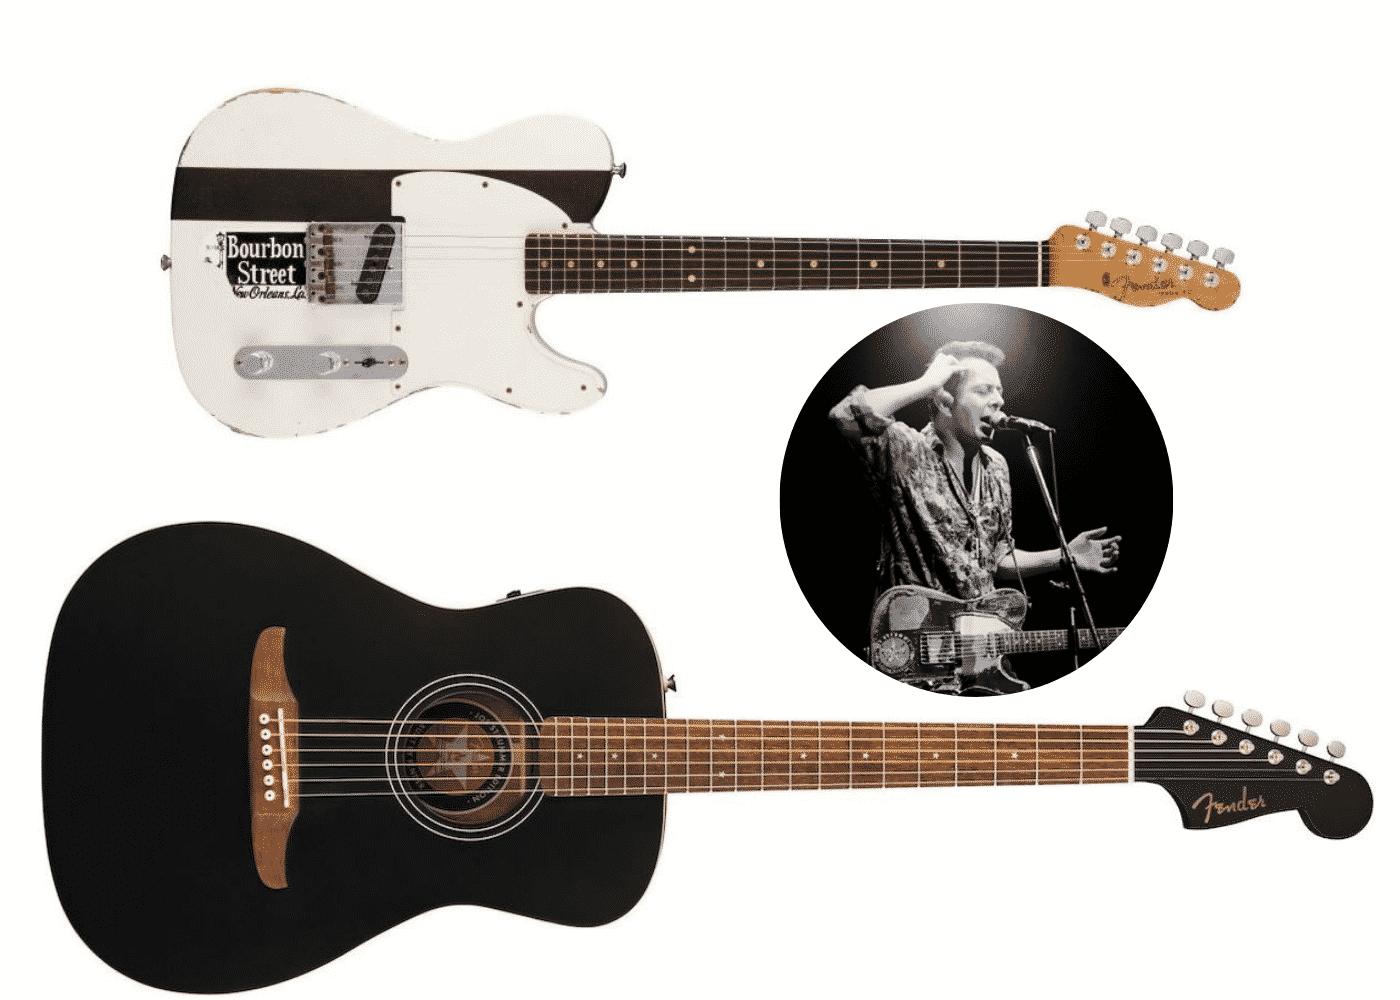 Joe Strummer guitares